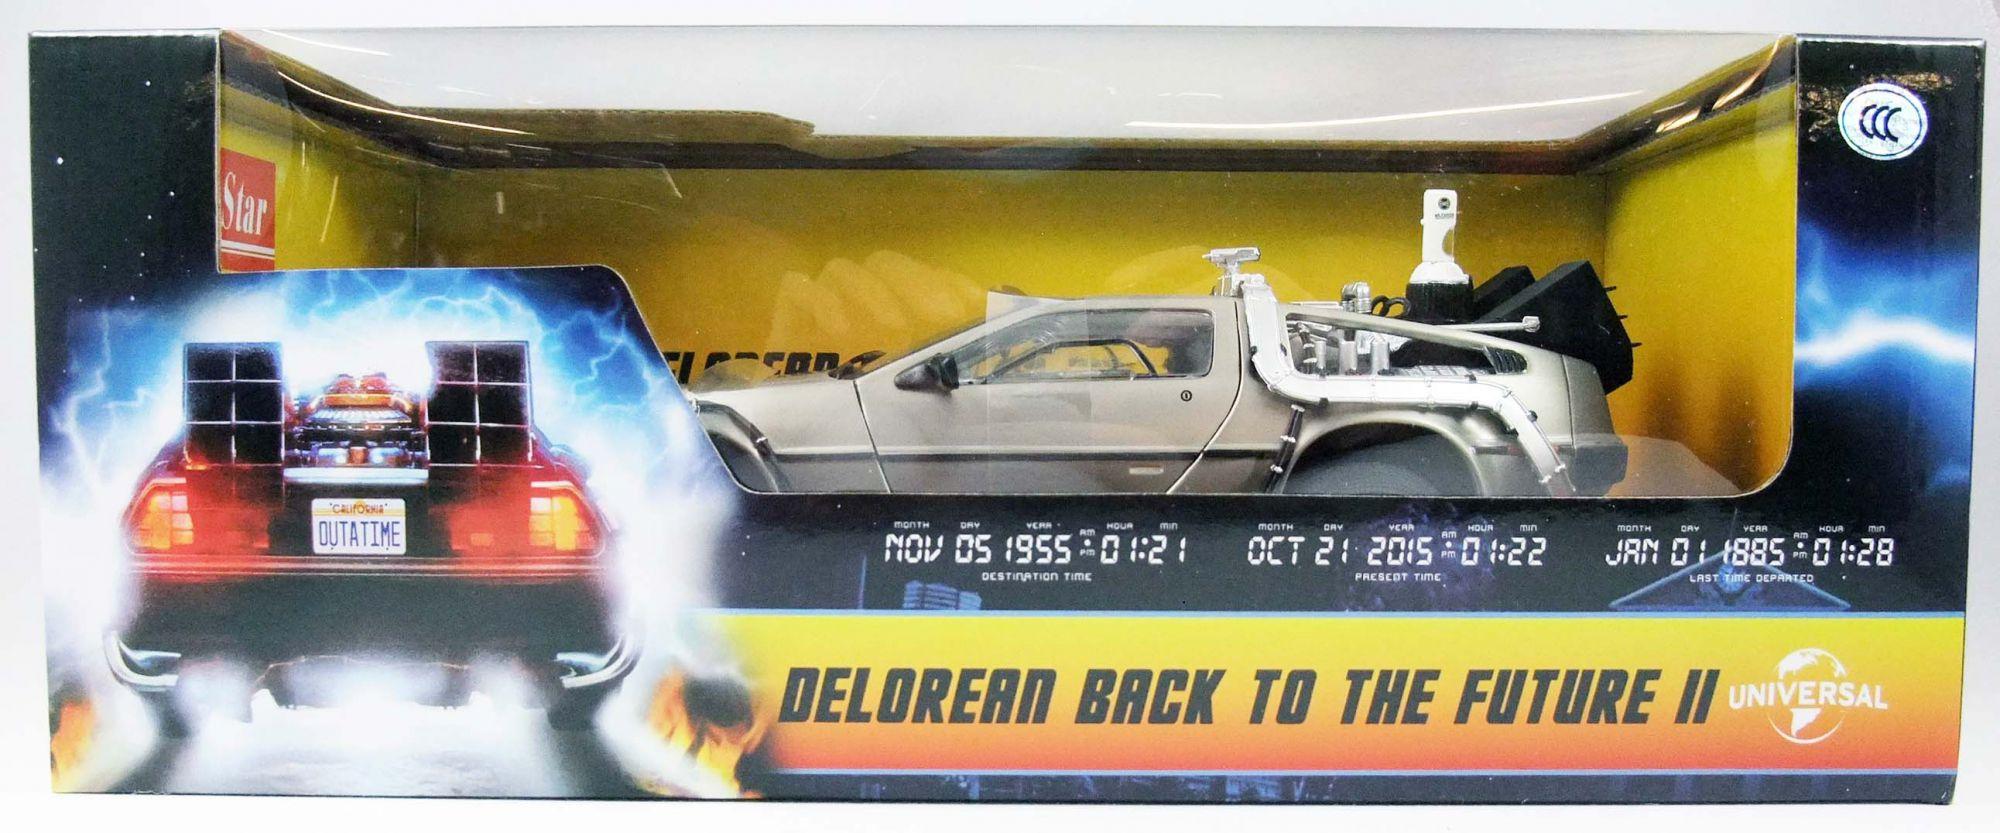 Retour vers le Futur Part.II - Sun Star - Delorean Time Machine